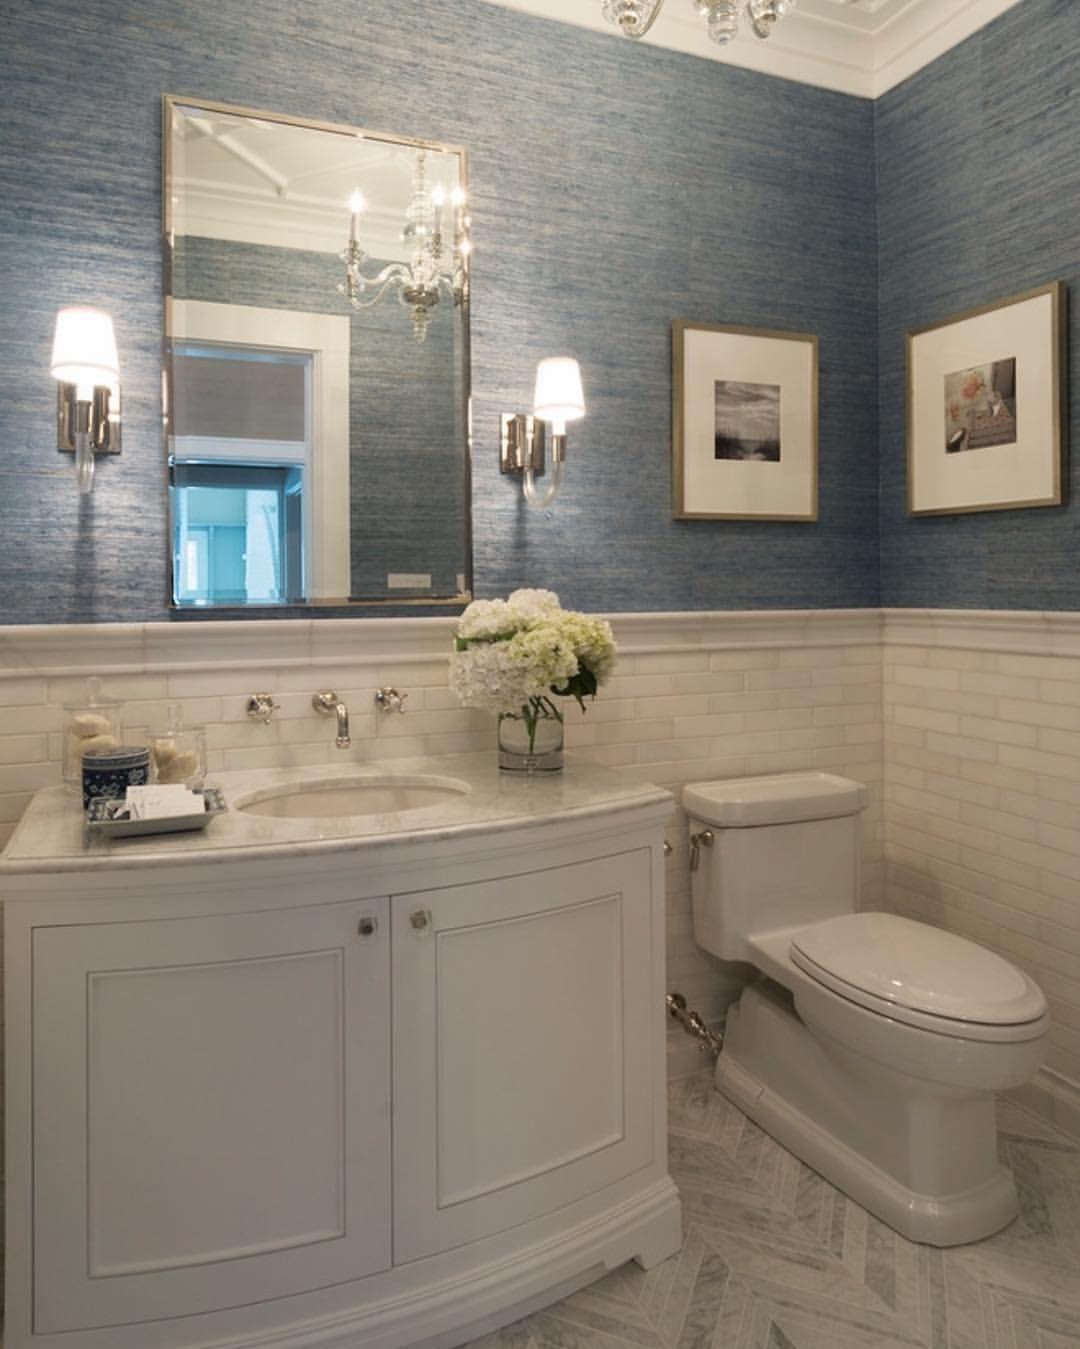 Favorite One Room Challenge Rooms Interior Bathroom I In 2018